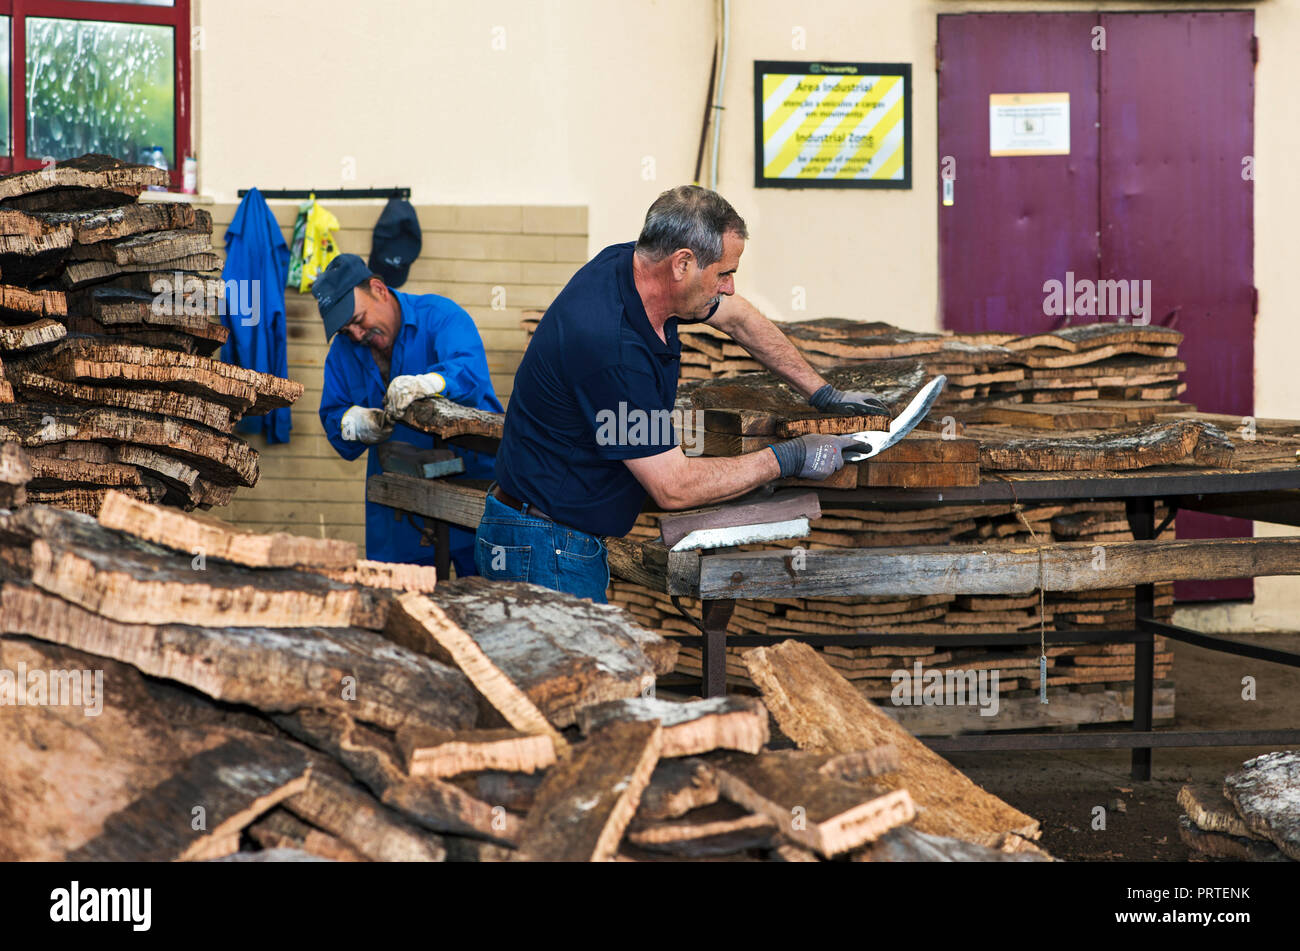 Bark of the cork oak (Quercus suber) is cut manually for further processing,  Cork factory Nova Cortica, Sao Bras de Alportel, Algarve, Portugal - Stock Image